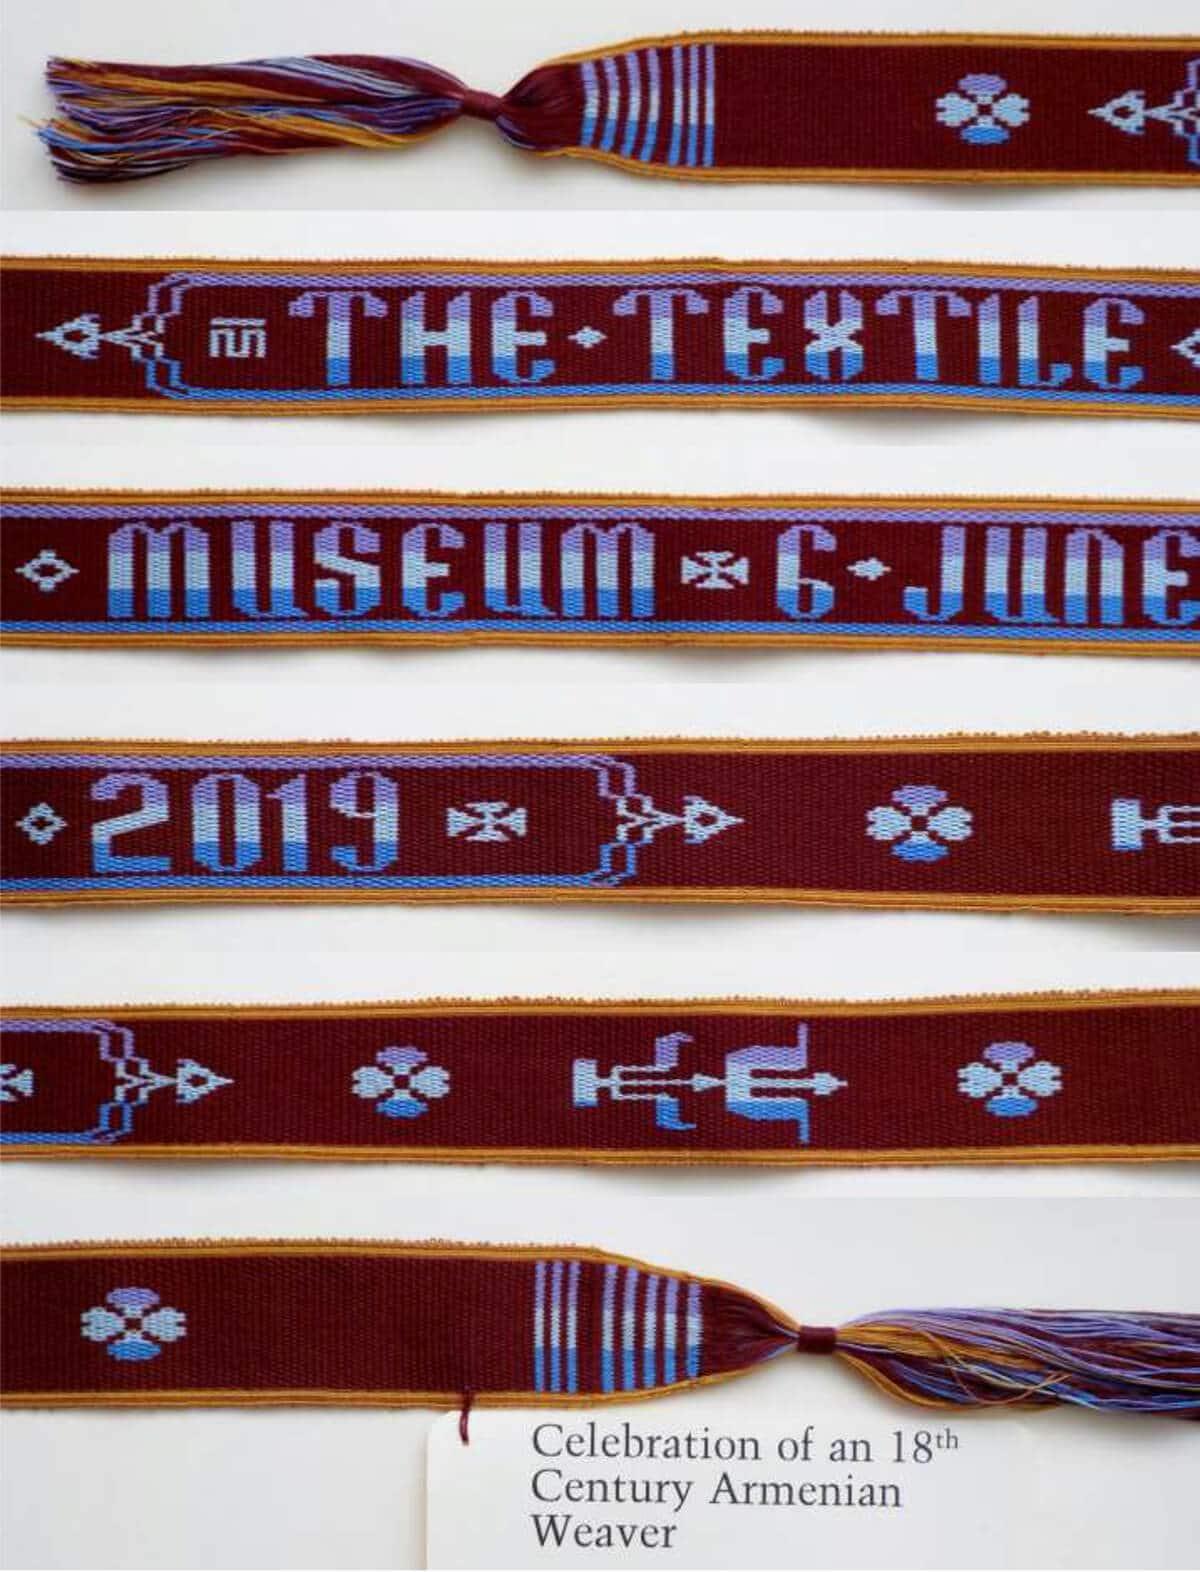 Figure 7 is the Textile Museum's logo celebration of an 18th Century Armenian Weaver